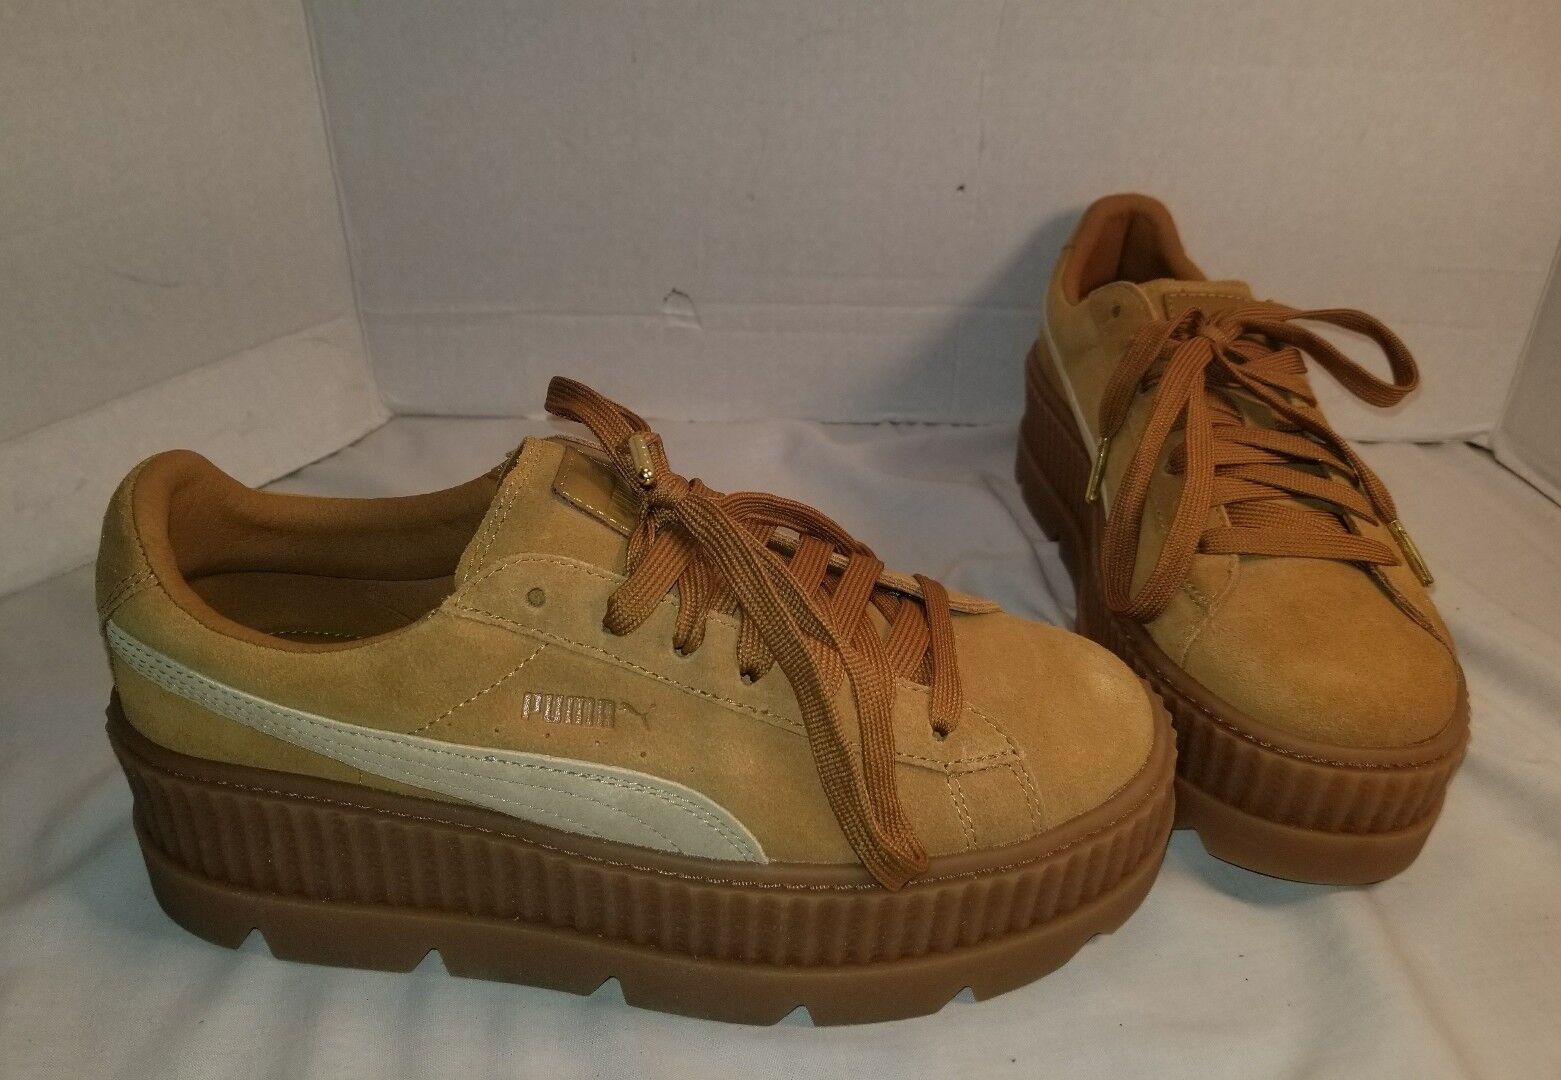 NEW PUMA FENTY BY RIHANNA CLETED CLETED CLETED CREEPER TAN SUEDE scarpe da ginnastica donna Dimensione US 9 3a6d10